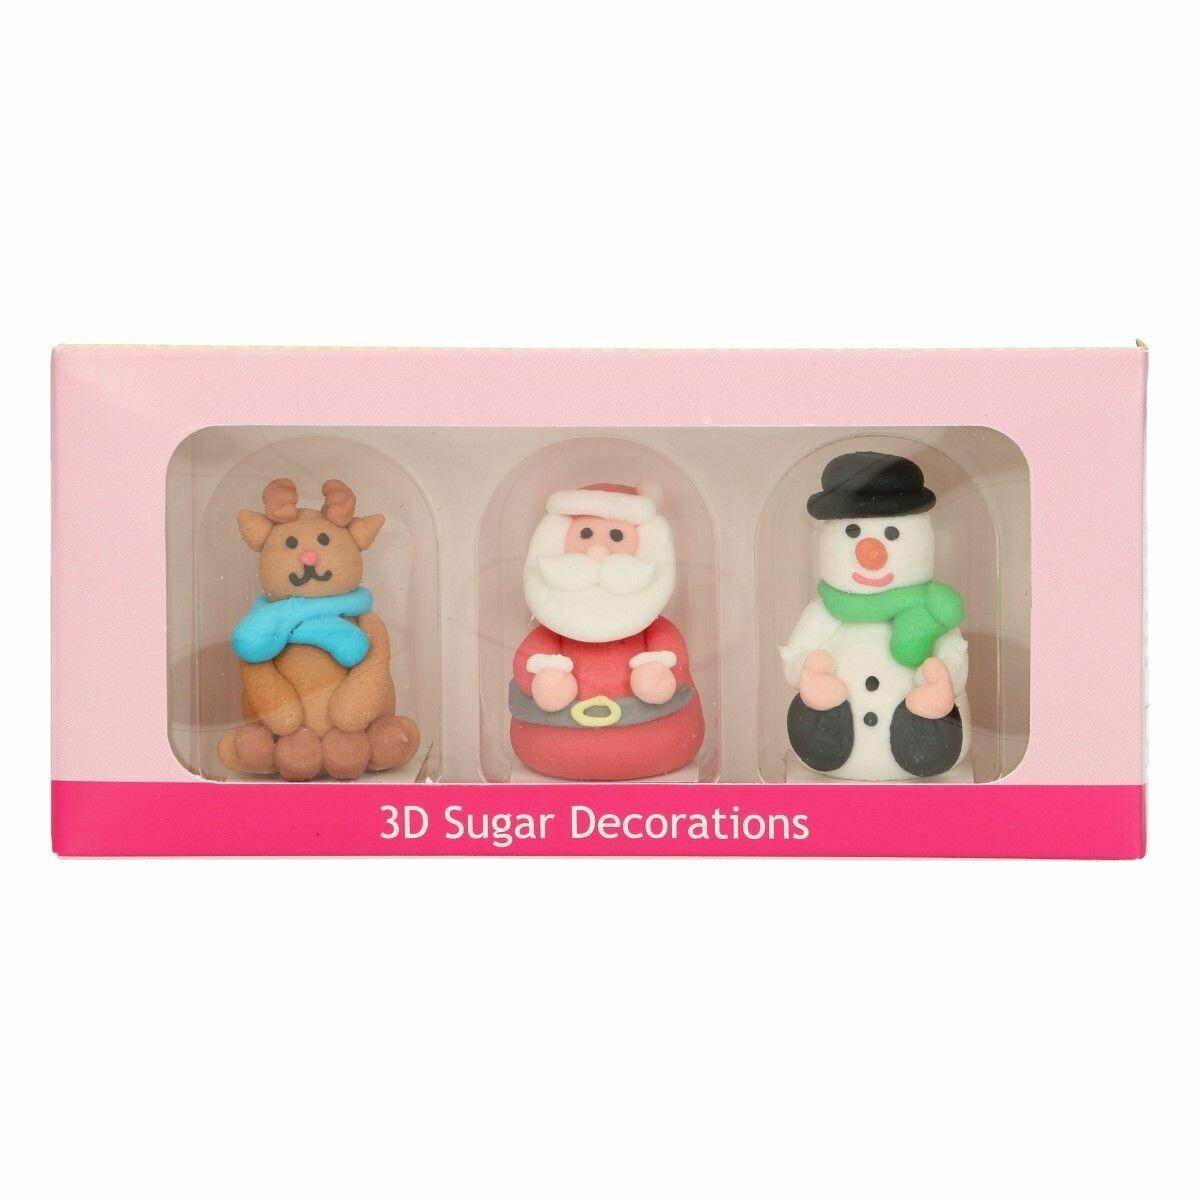 FunCakes Sugar Decorations 3D Christmas Figures Set of 3- Χριστουγεννιάτικα Ζαχαρωτά 3D - ΑΓΙΟΣ ΒΑΣΙΛΗΣ, ΡΟΥΝΤΟΛΦ, ΧΙΟΝΑΝΘΡΩΠΟΣ